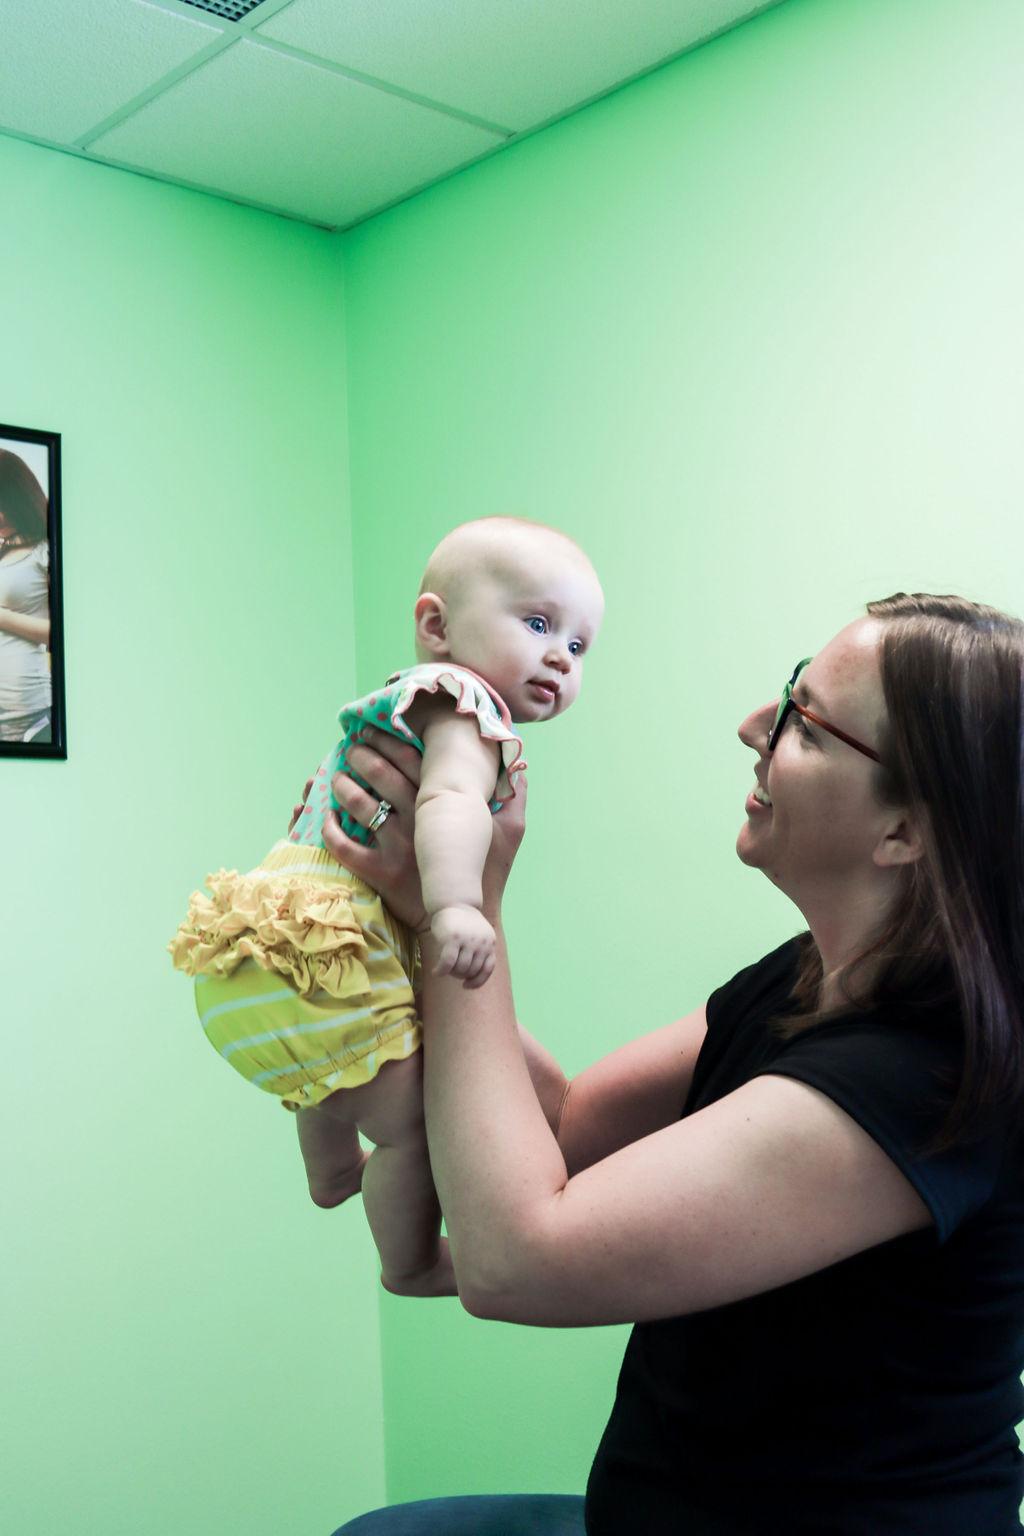 Infant Holding